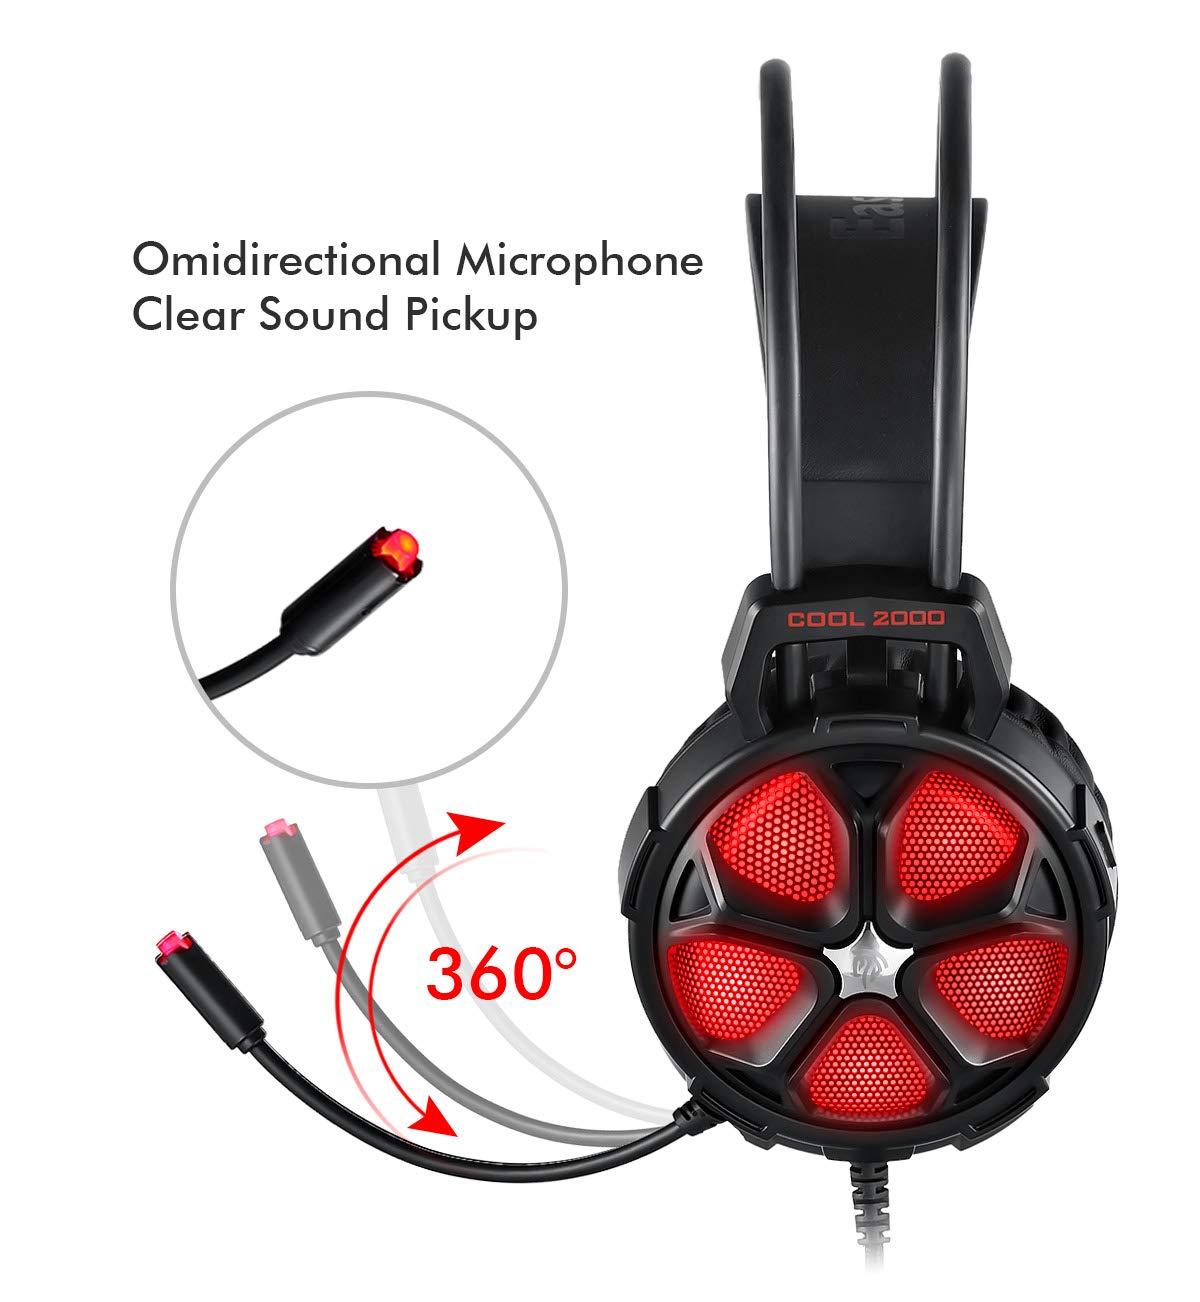 PC Headset EasySMX USB Gaming Headset 7.1 Surround Sound Stereo Gaming Kopfh/örer f/ür PS4 Over-Ear Gamer Headphones mit Mikrofon PC Games